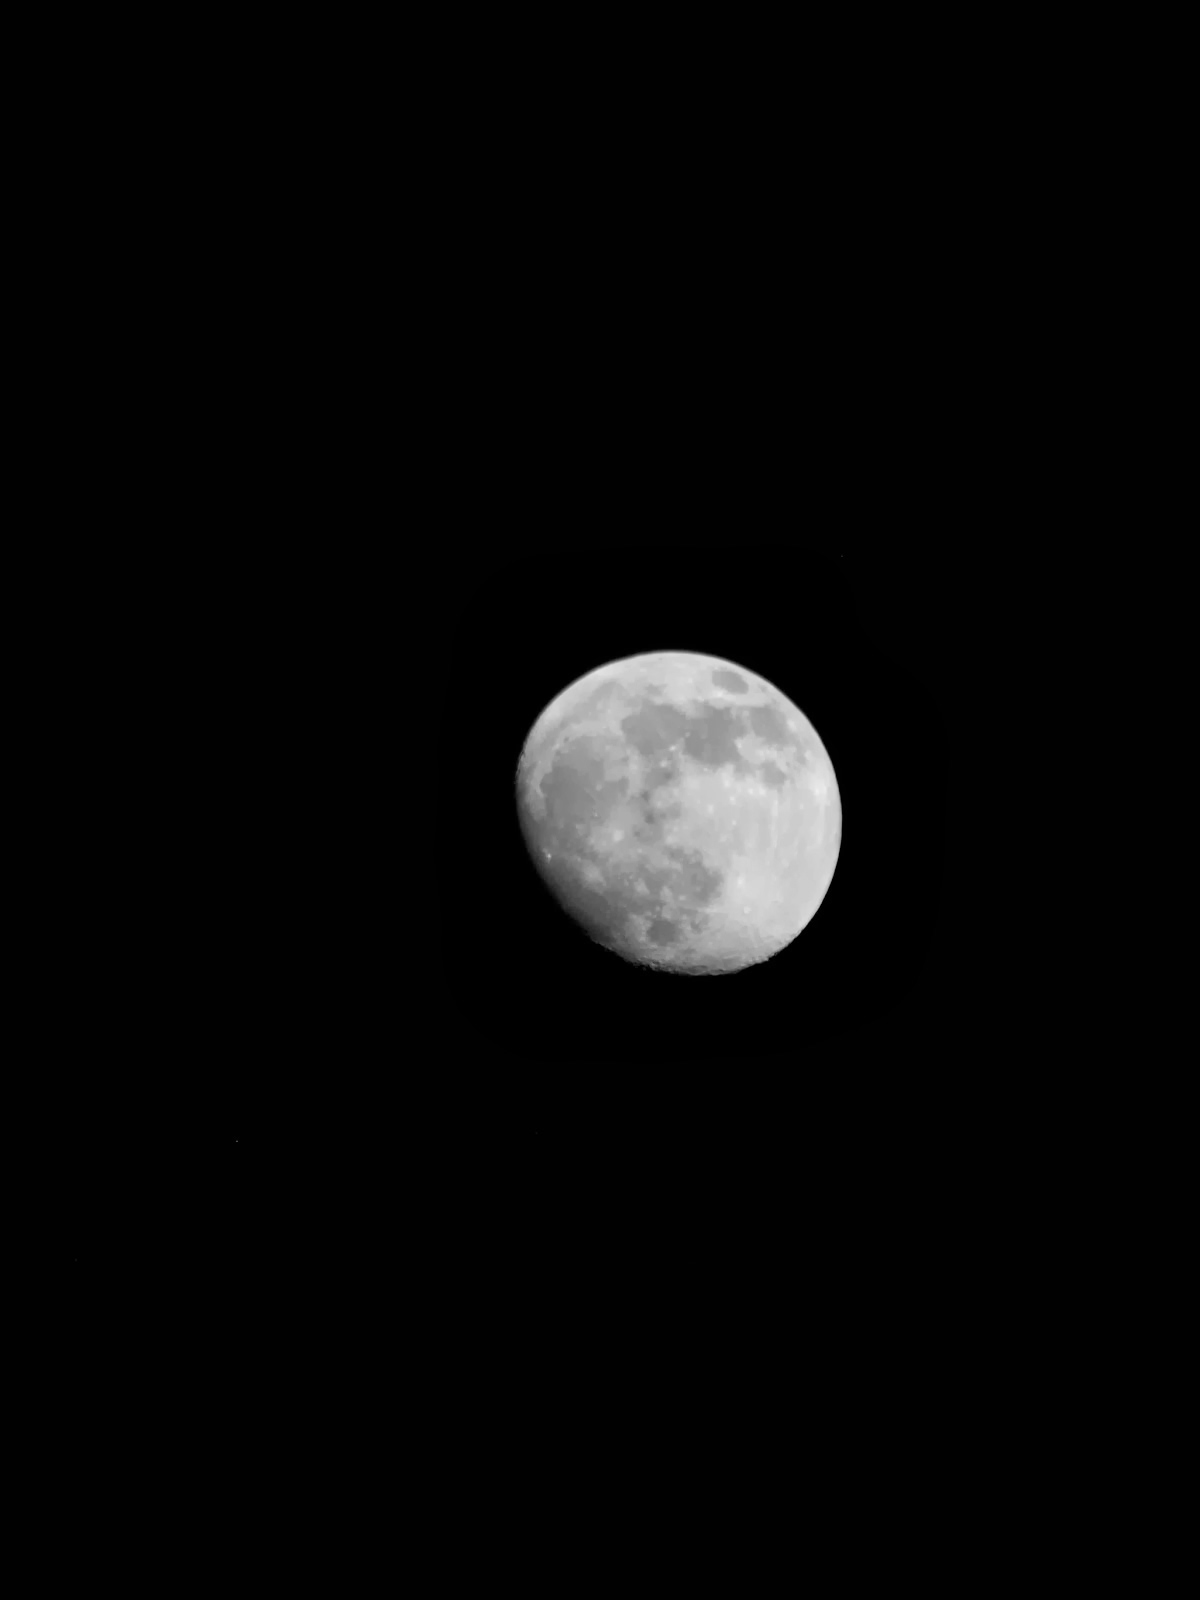 Sonoran Moon